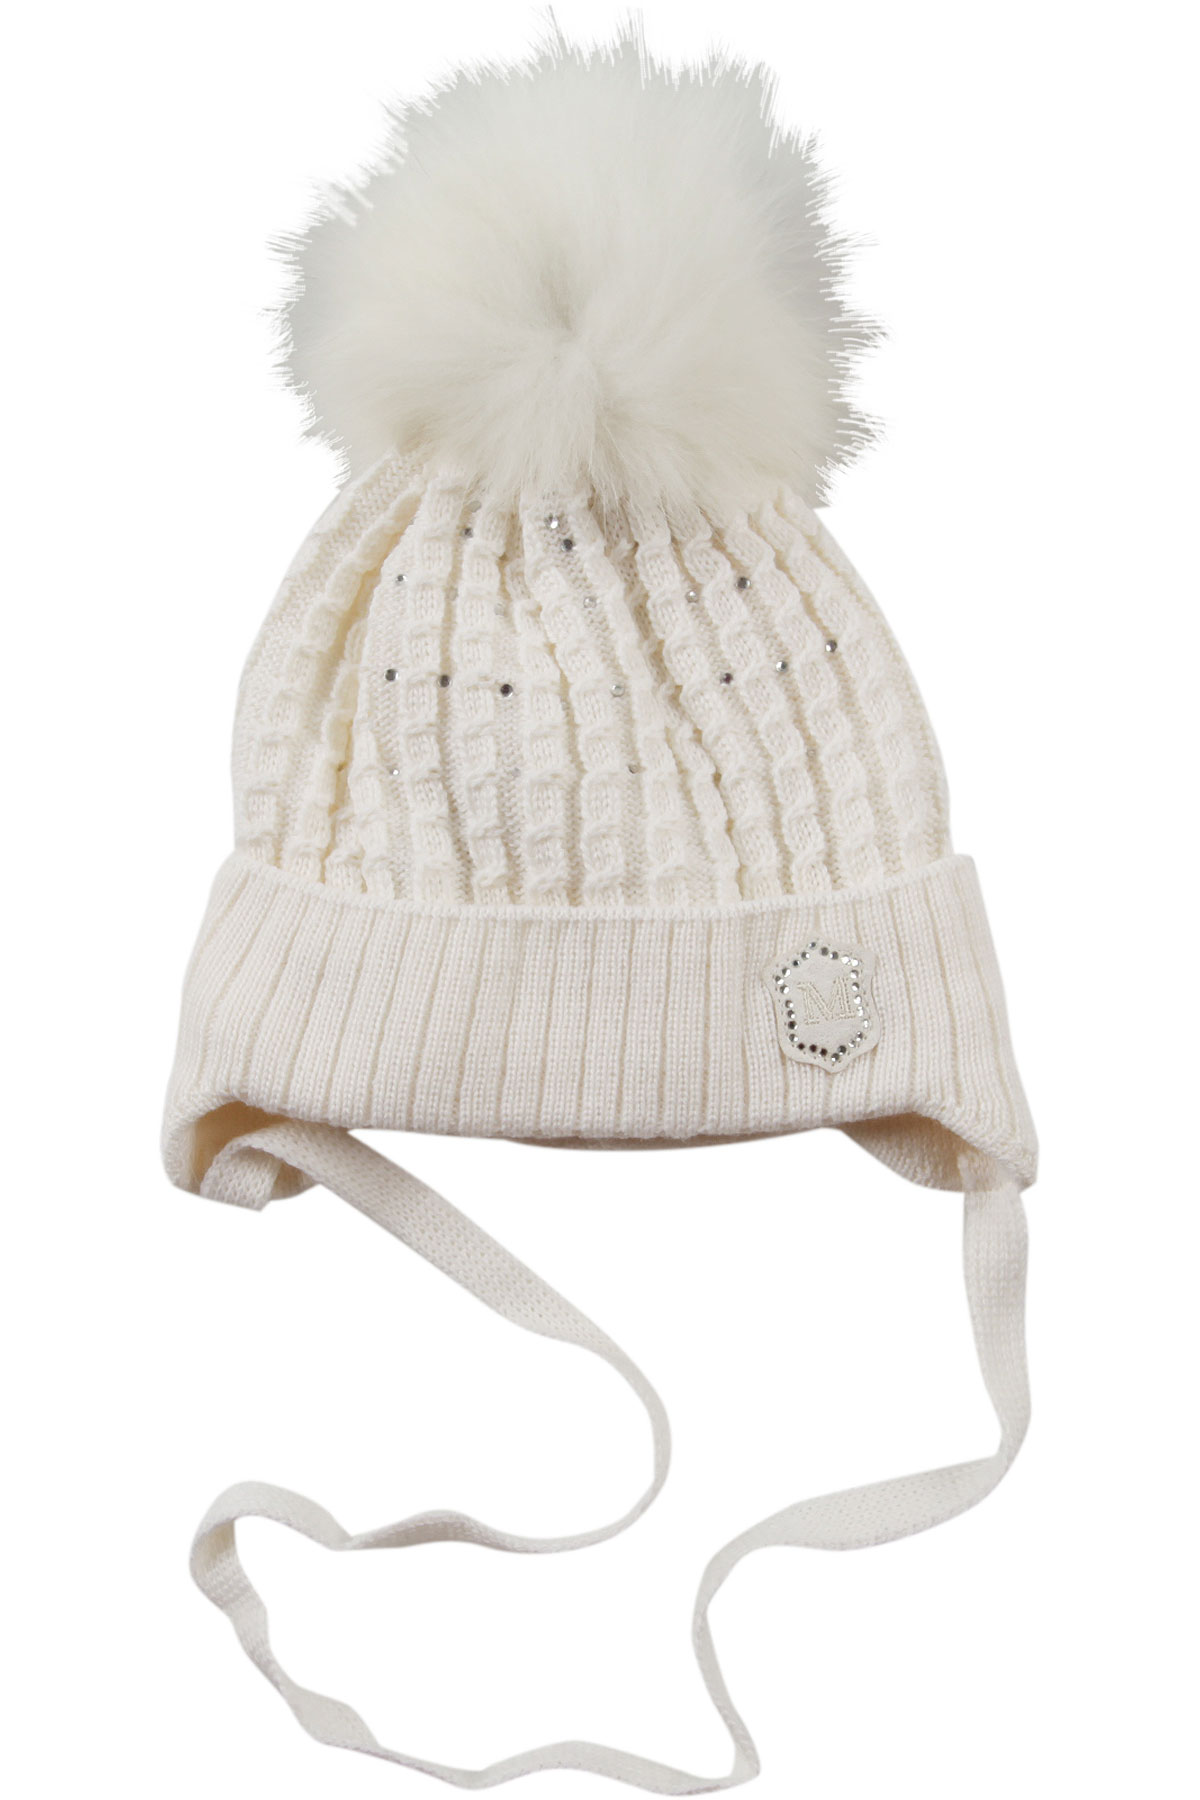 Image of Monnalisa Baby Hats for Girls, Cream, Acrylic, 2017, 12M 18M 2Y 6M 9M